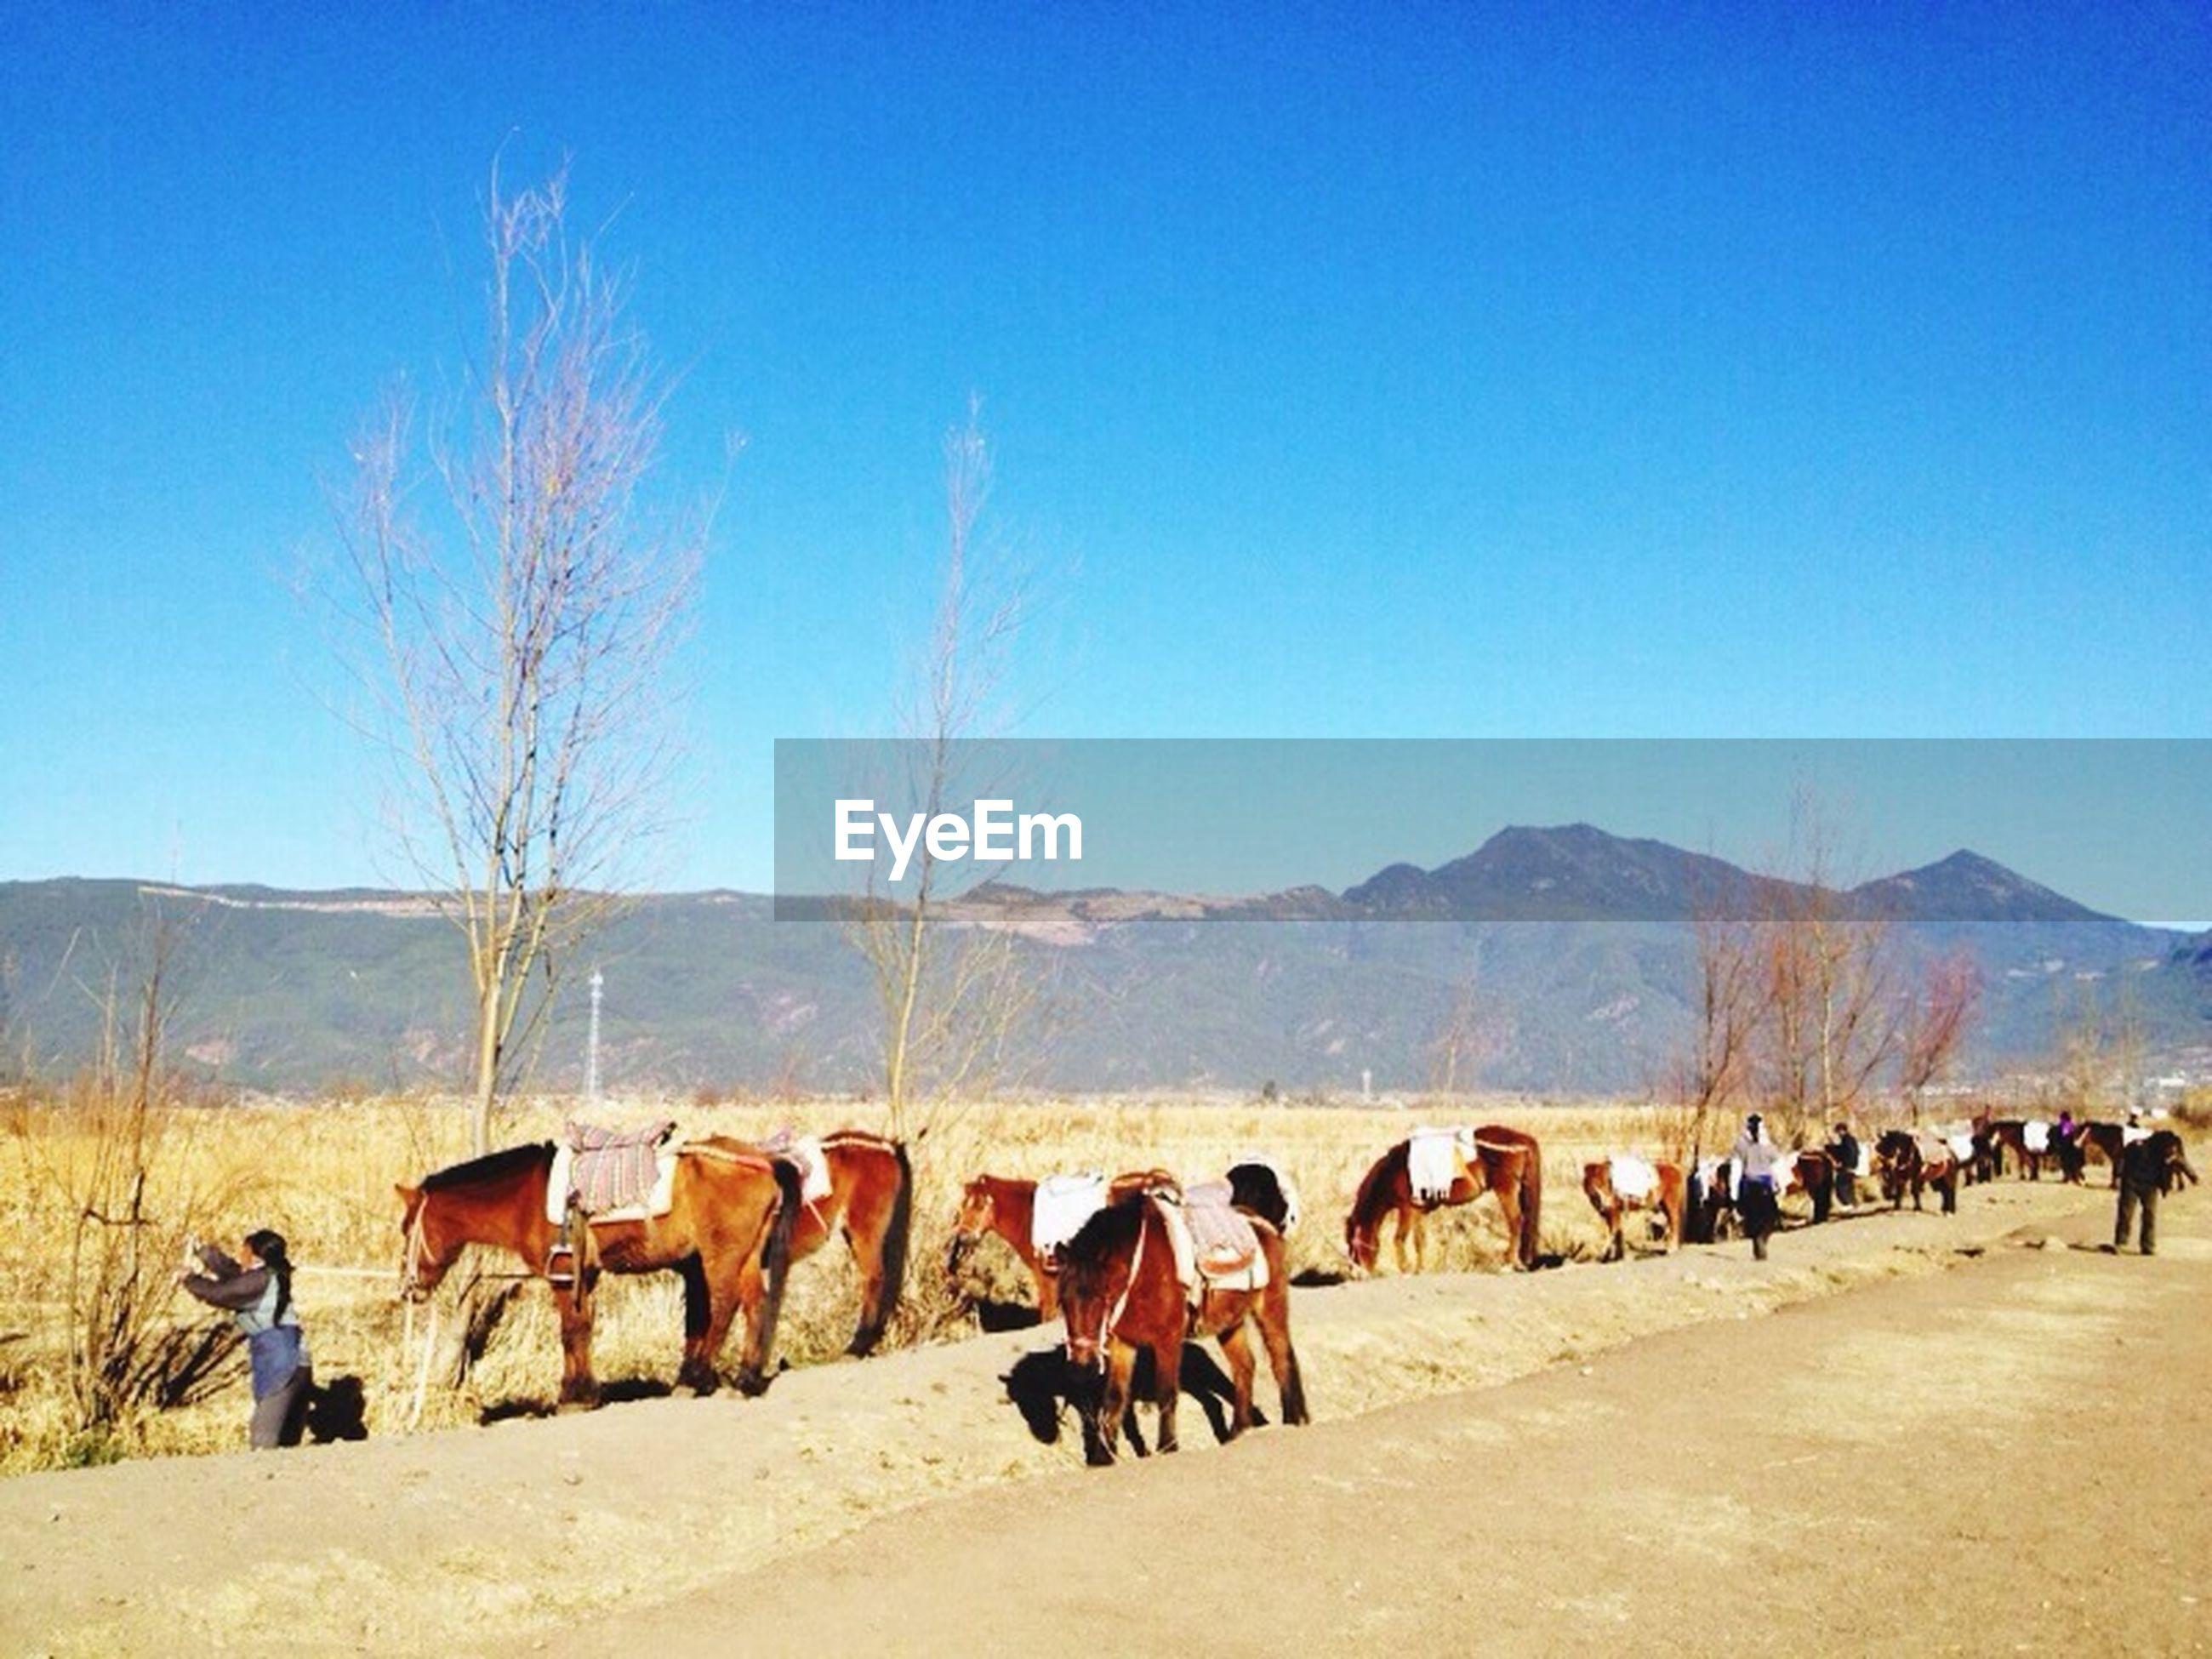 clear sky, mountain, landscape, blue, desert, mountain range, copy space, tranquil scene, arid climate, nature, livestock, tranquility, sky, non-urban scene, scenics, field, horizon over land, animal themes, sand